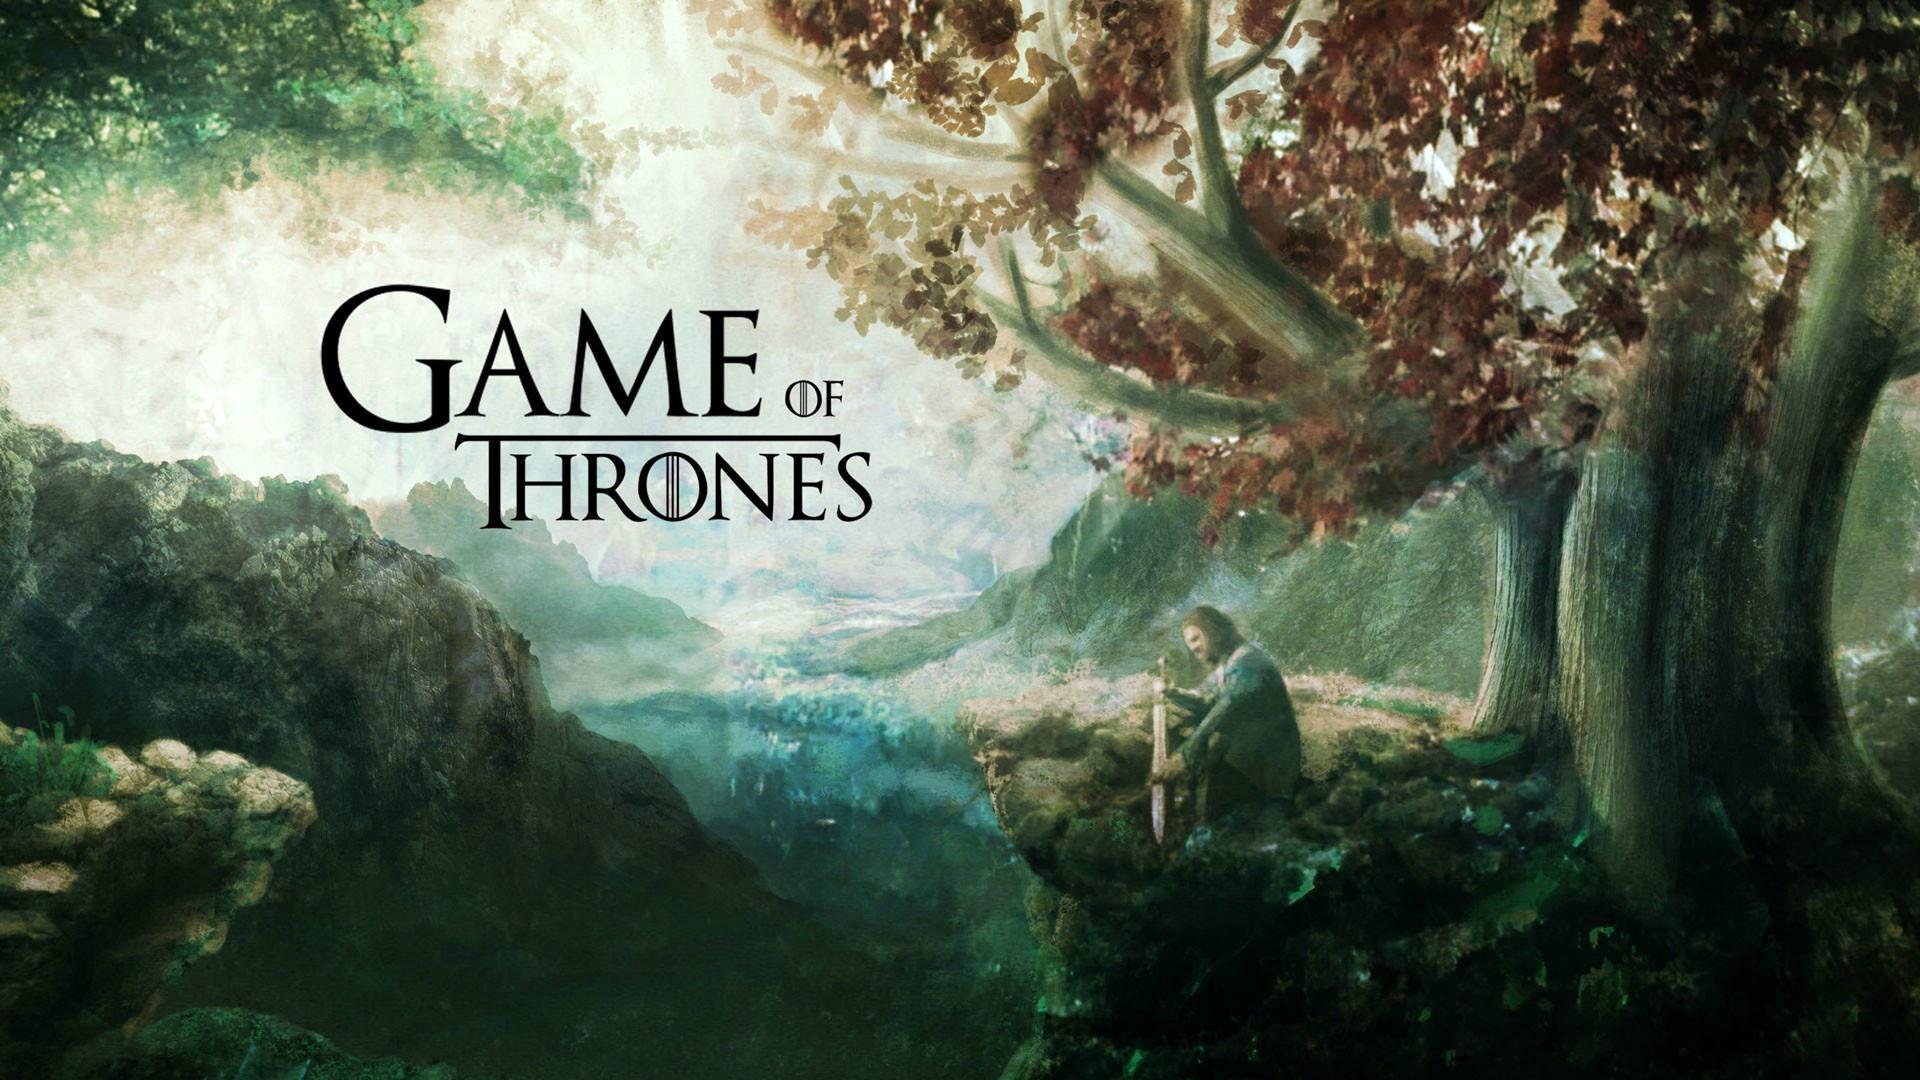 Movies Wallpapers Game Of Thrones Tv Series 6679 1920x1080 pixel 1920x1080